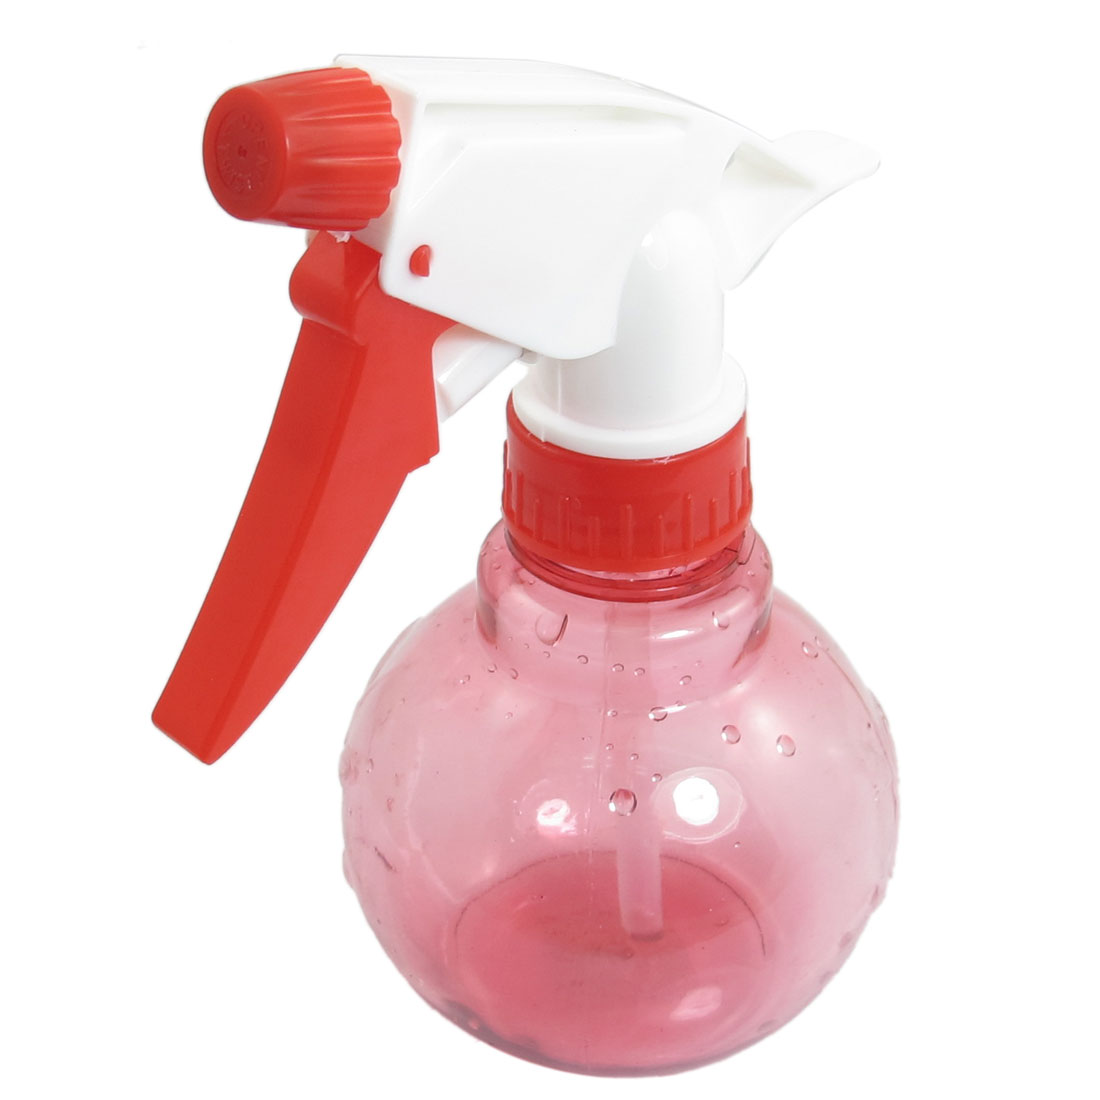 Red Beauty Tool Plastic Water Spraying Sprinkler Bottle 200ml